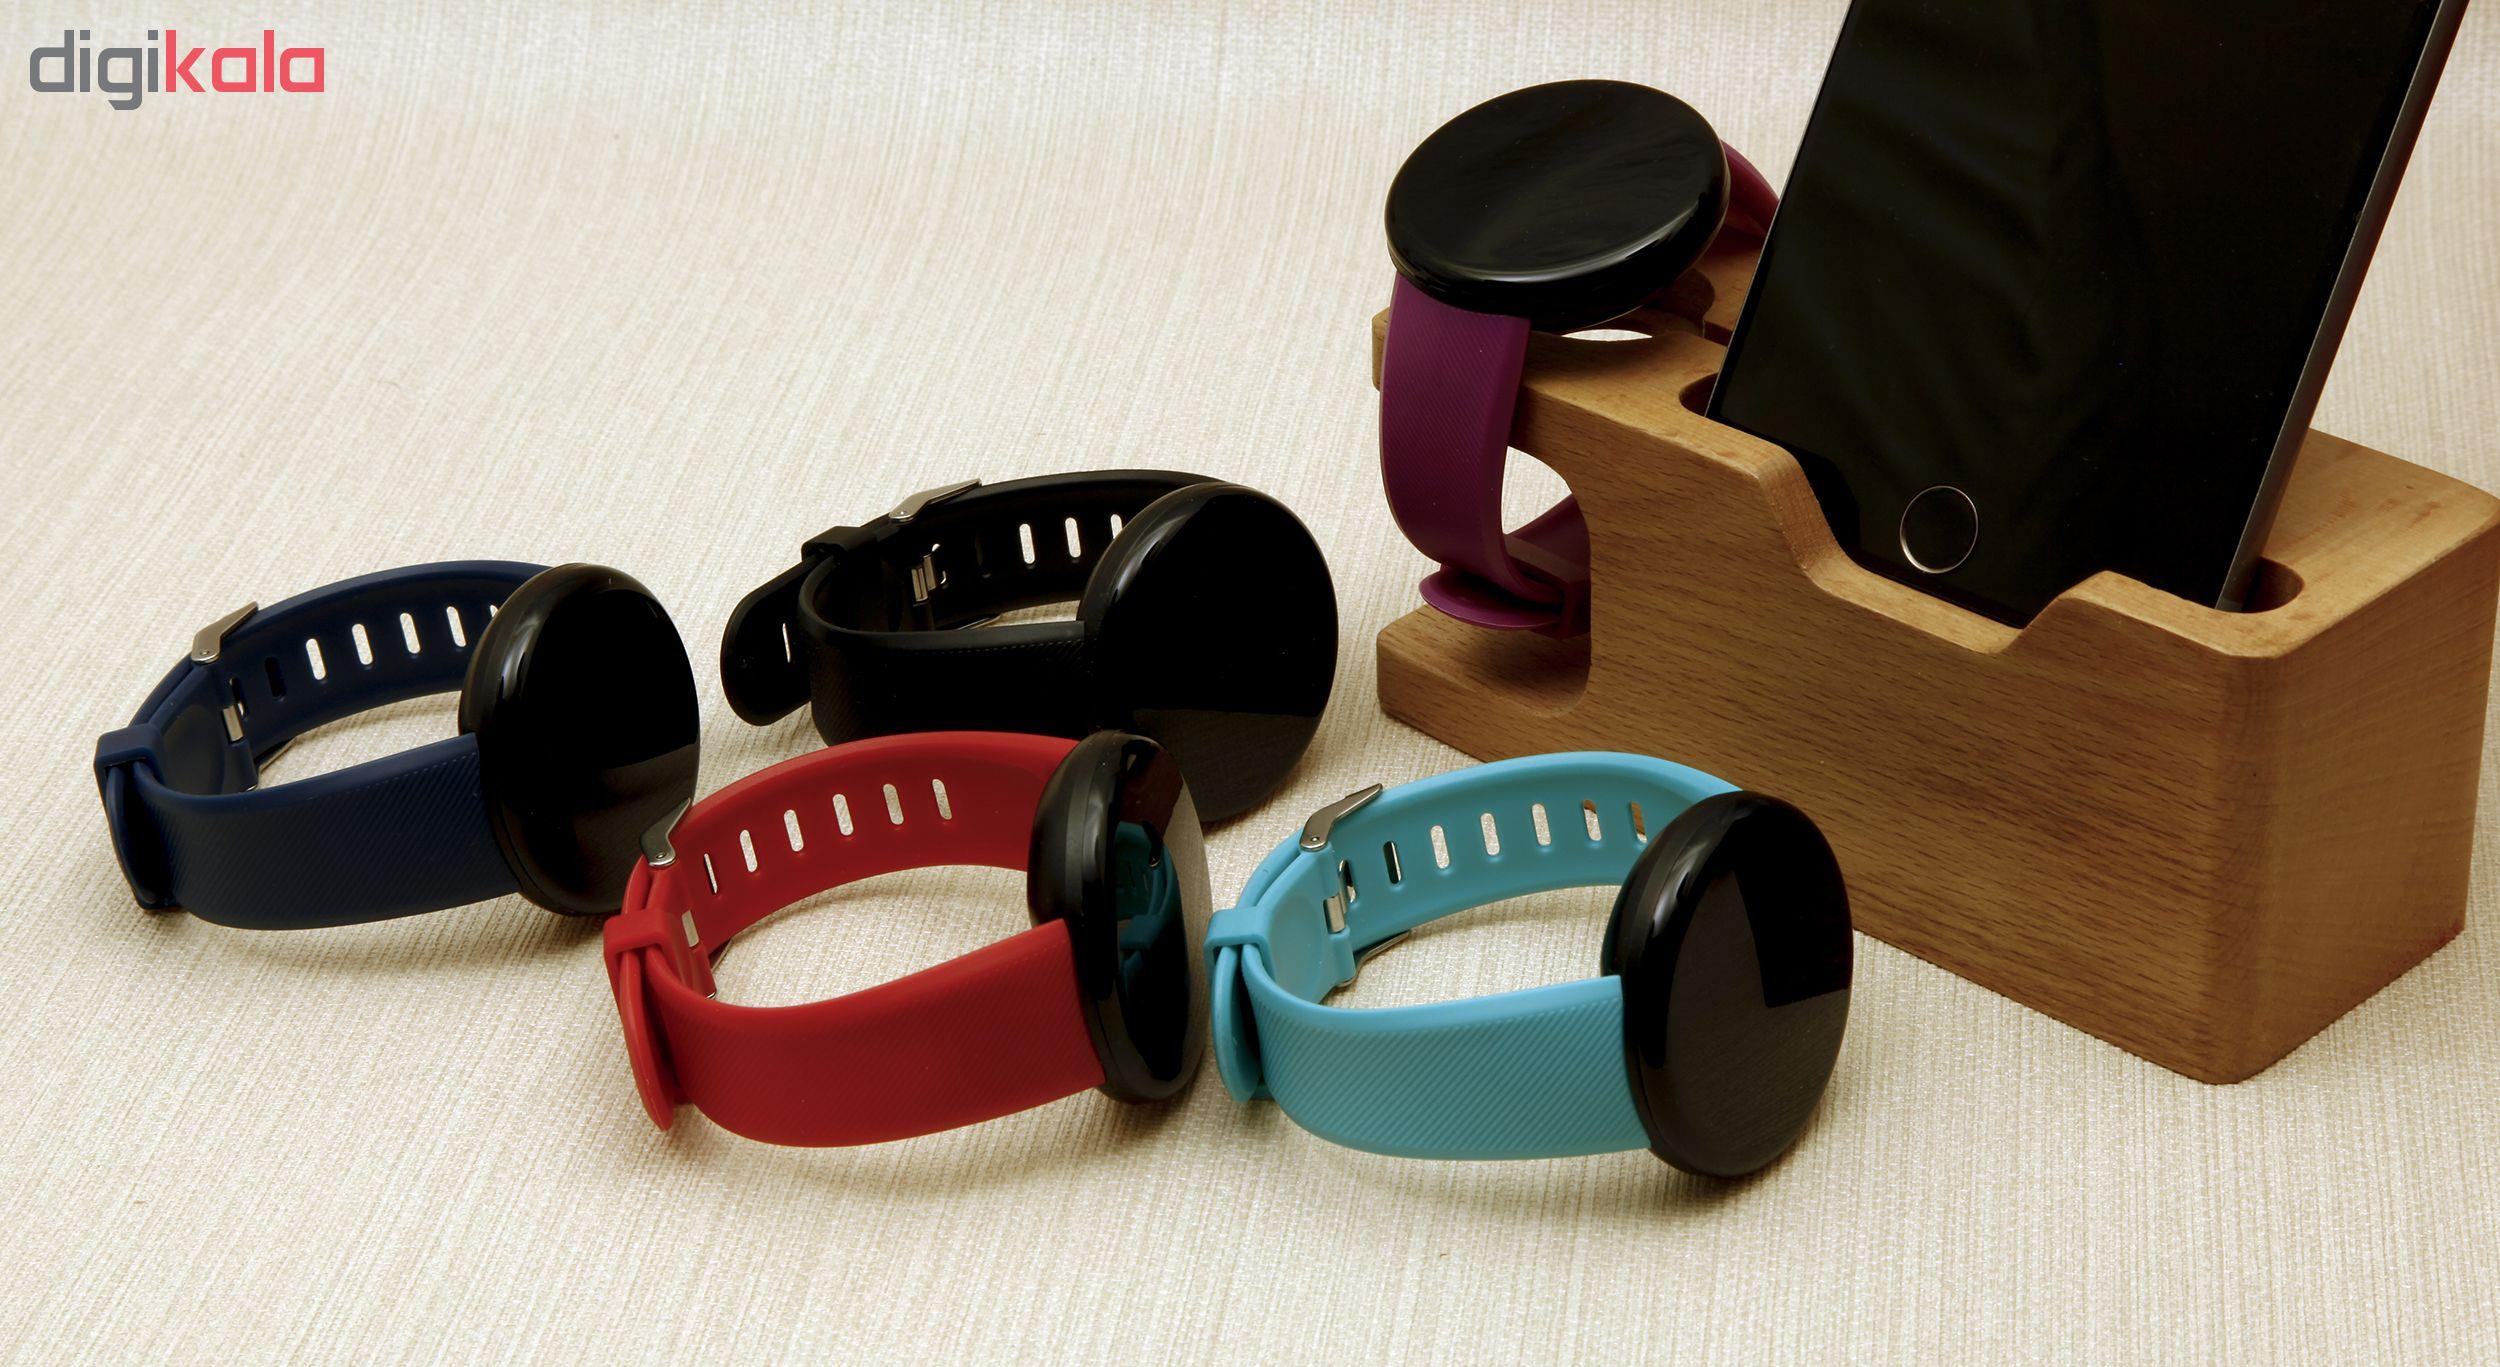 ساعت هوشمند مدل Bakeey D18 main 1 19